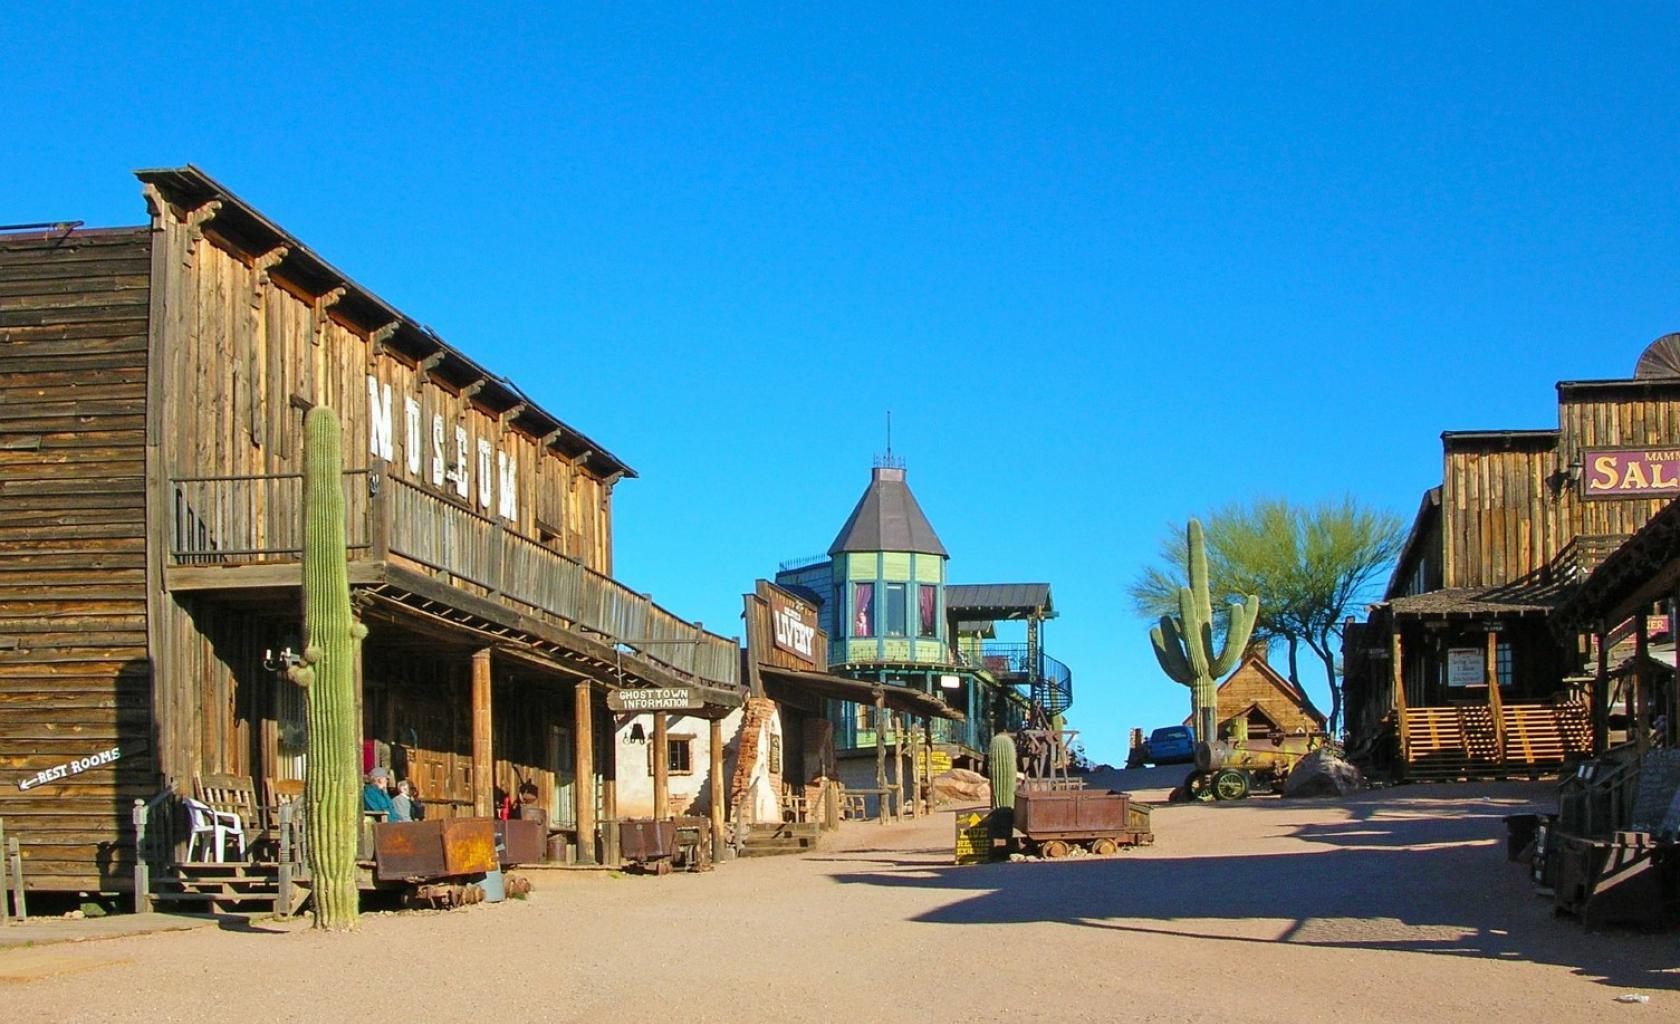 Arizona - Wilde Westen Town